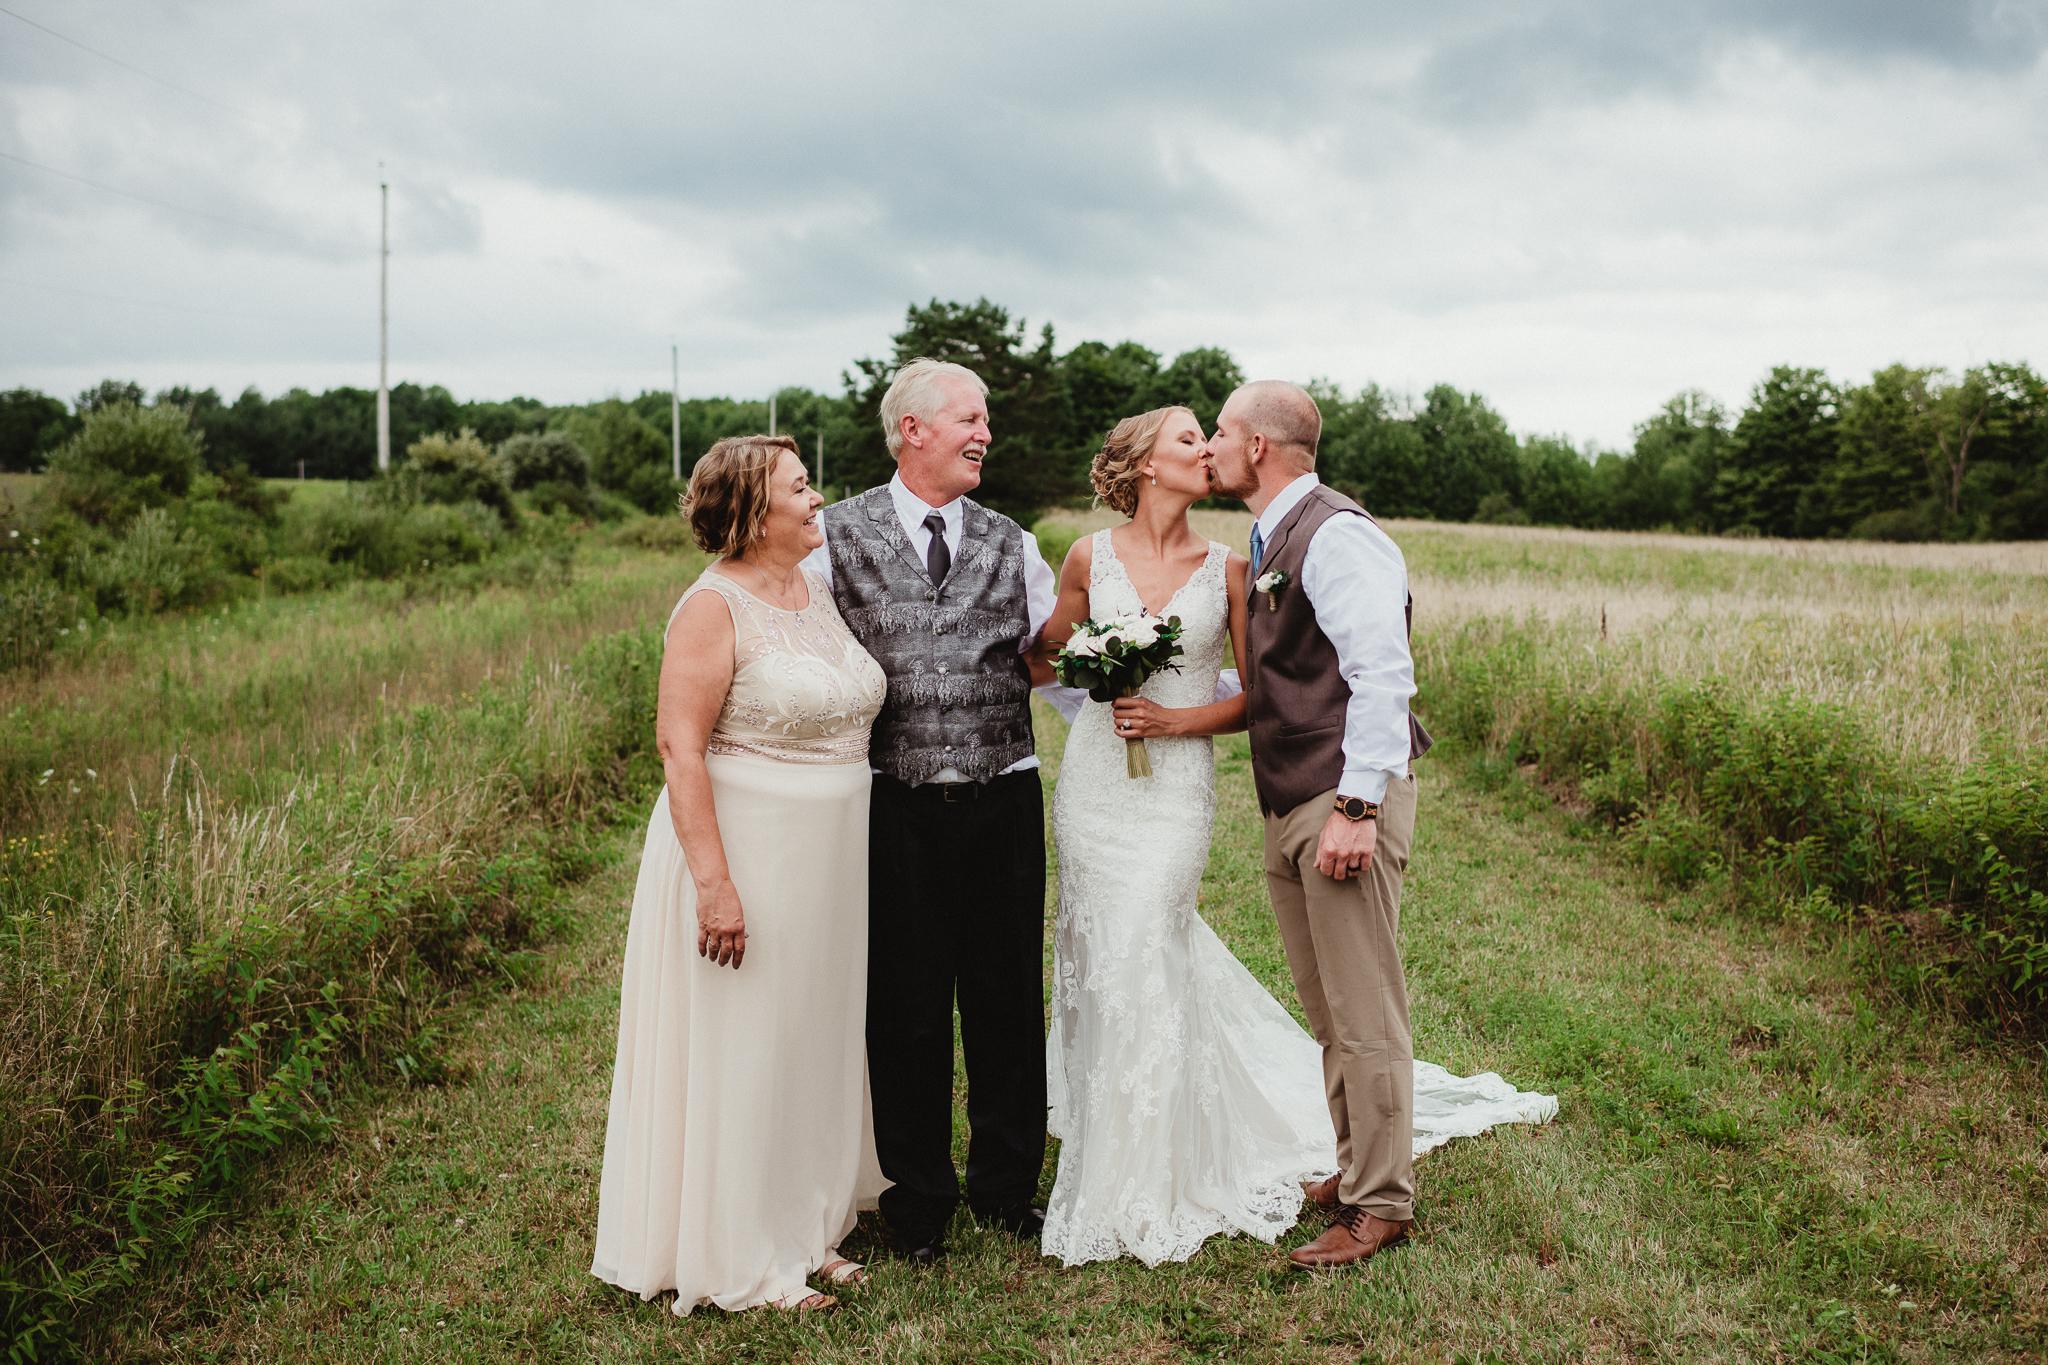 Wedding Photography Rochester, NY